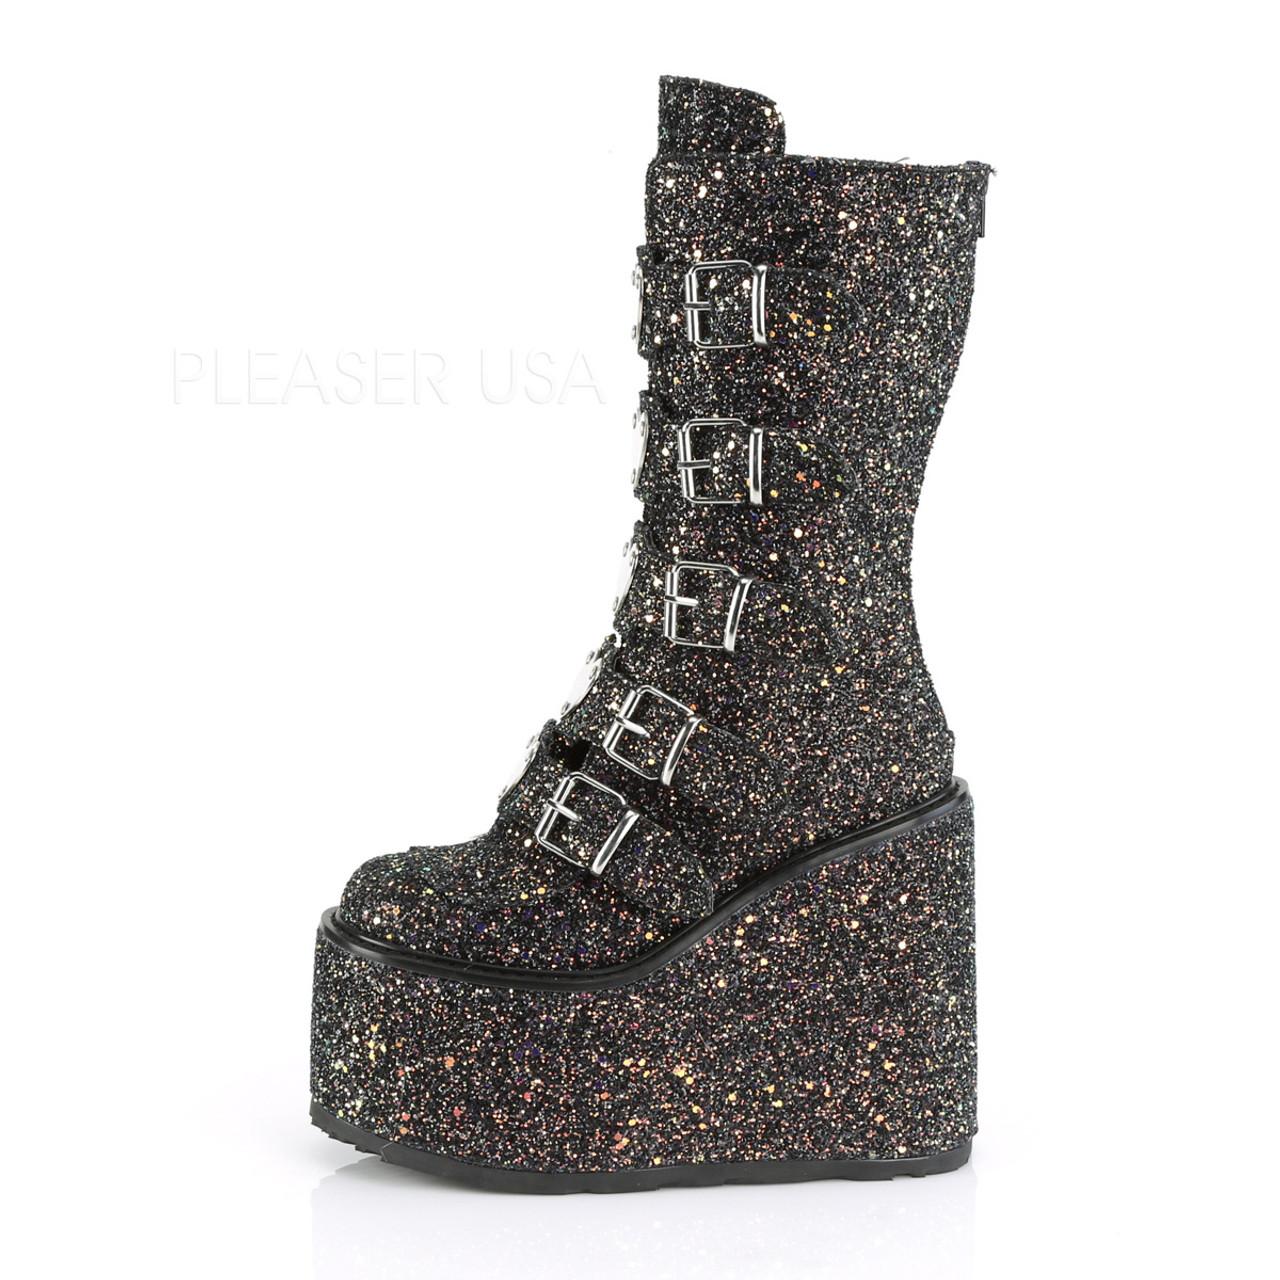 503ef0f670d I Heart Glitter Boots